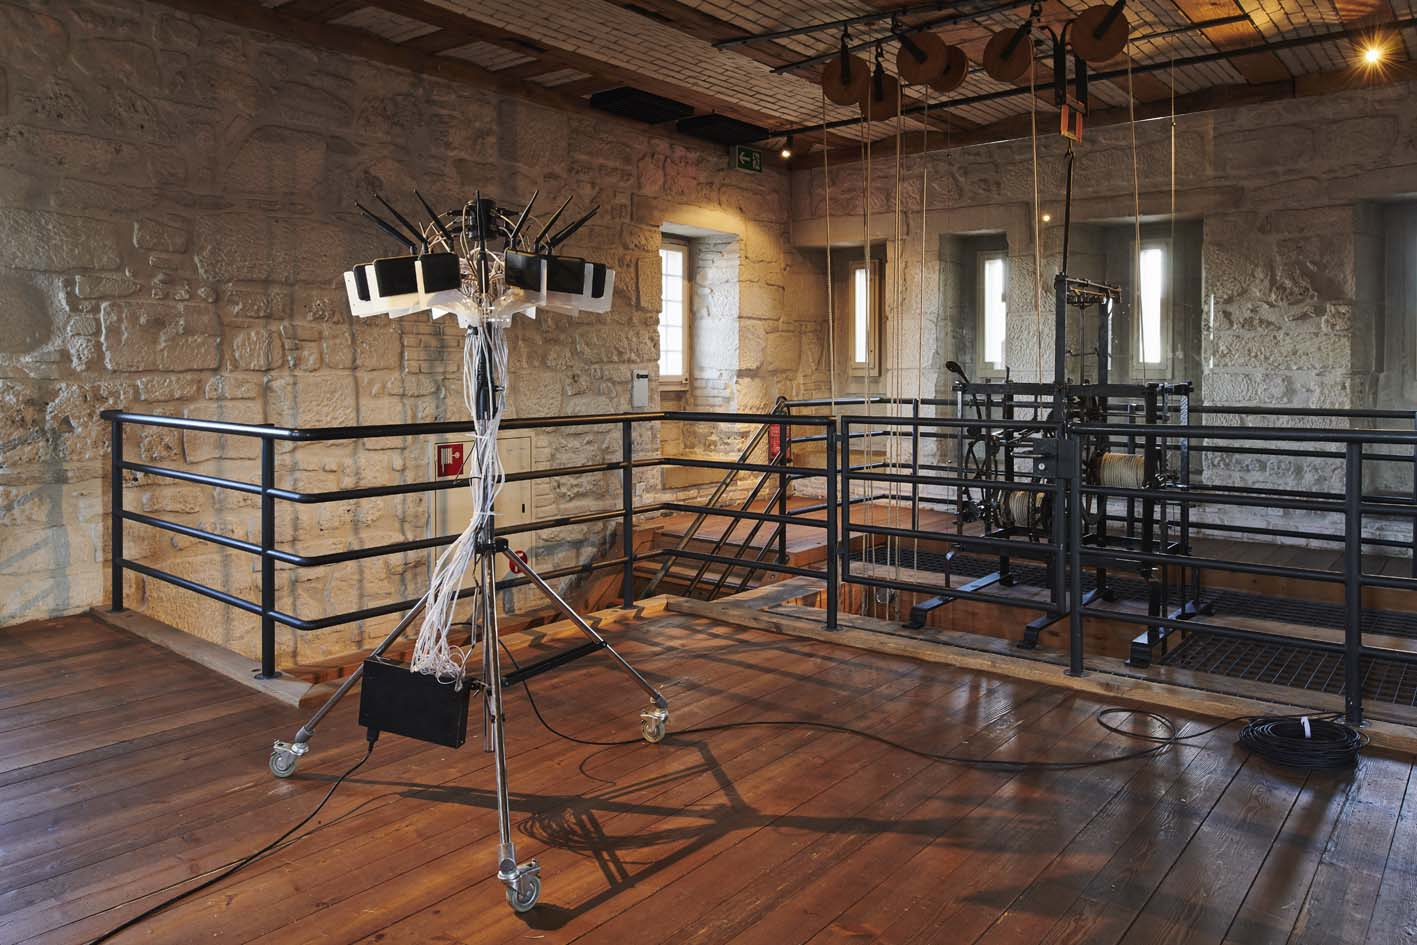 Gordan Savi č i ć  & Bengt Sjölén,  Packetbrücke,  2012–2015, Website  https://criticalengineering.org/projects/packetbridge , Wireless Packet Relocator, 14 custom-modified WLAN Routers, EL-wires, Courtesy the artists, Foto: Dominique Uldry